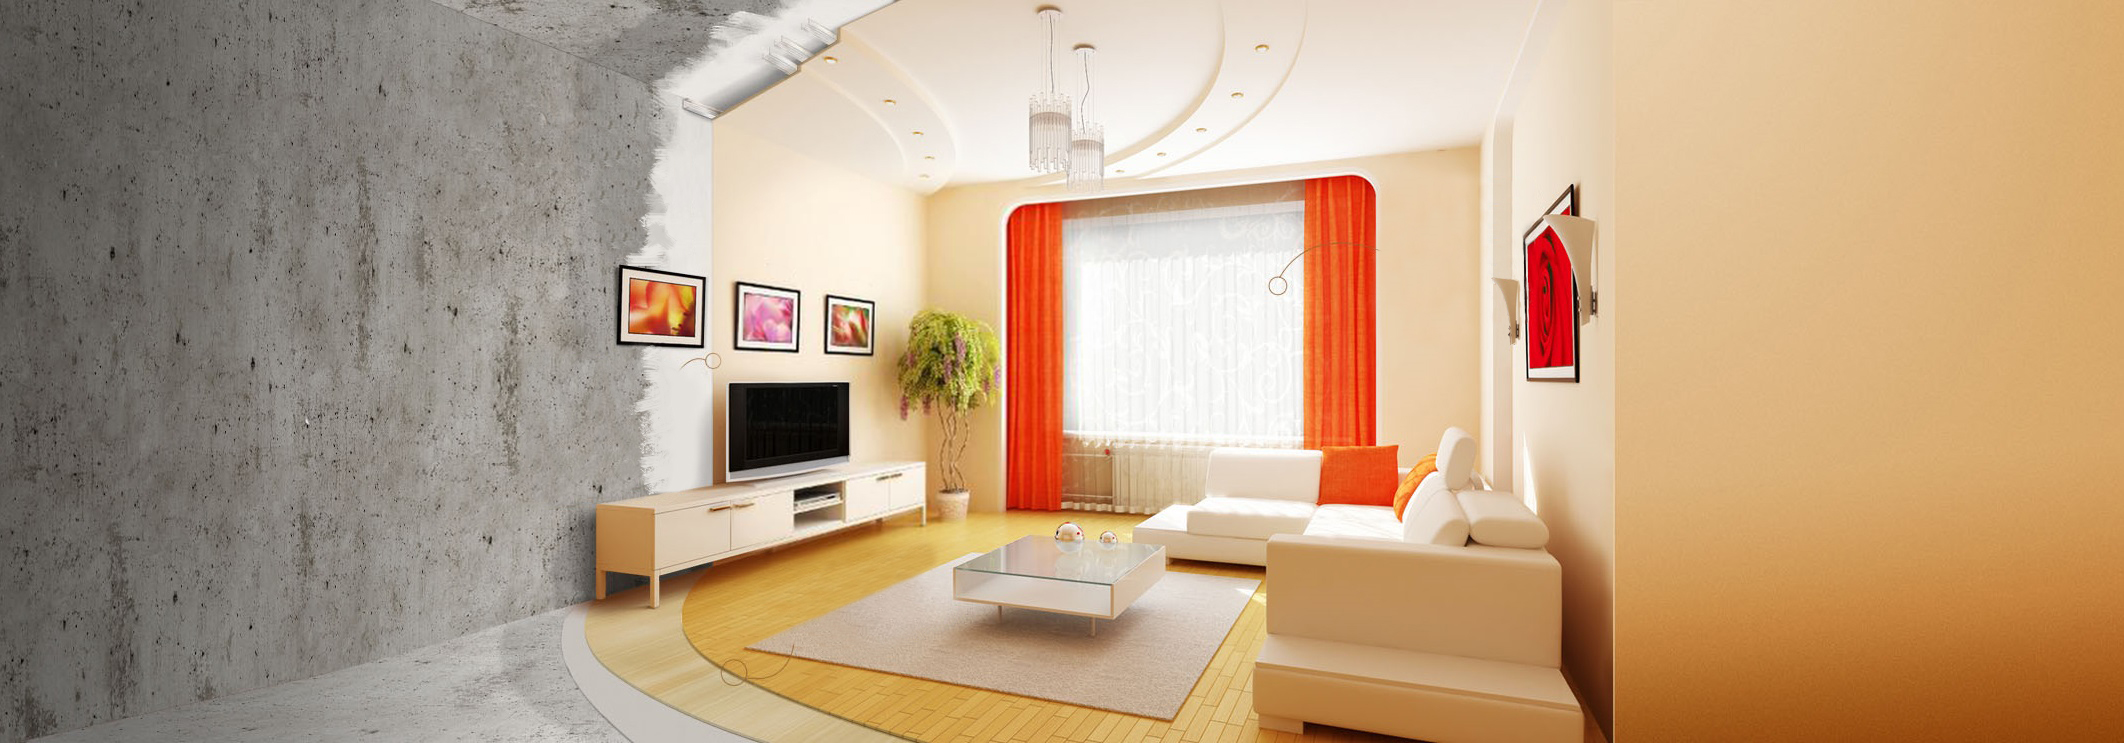 Комплексный-ремонт-квартир